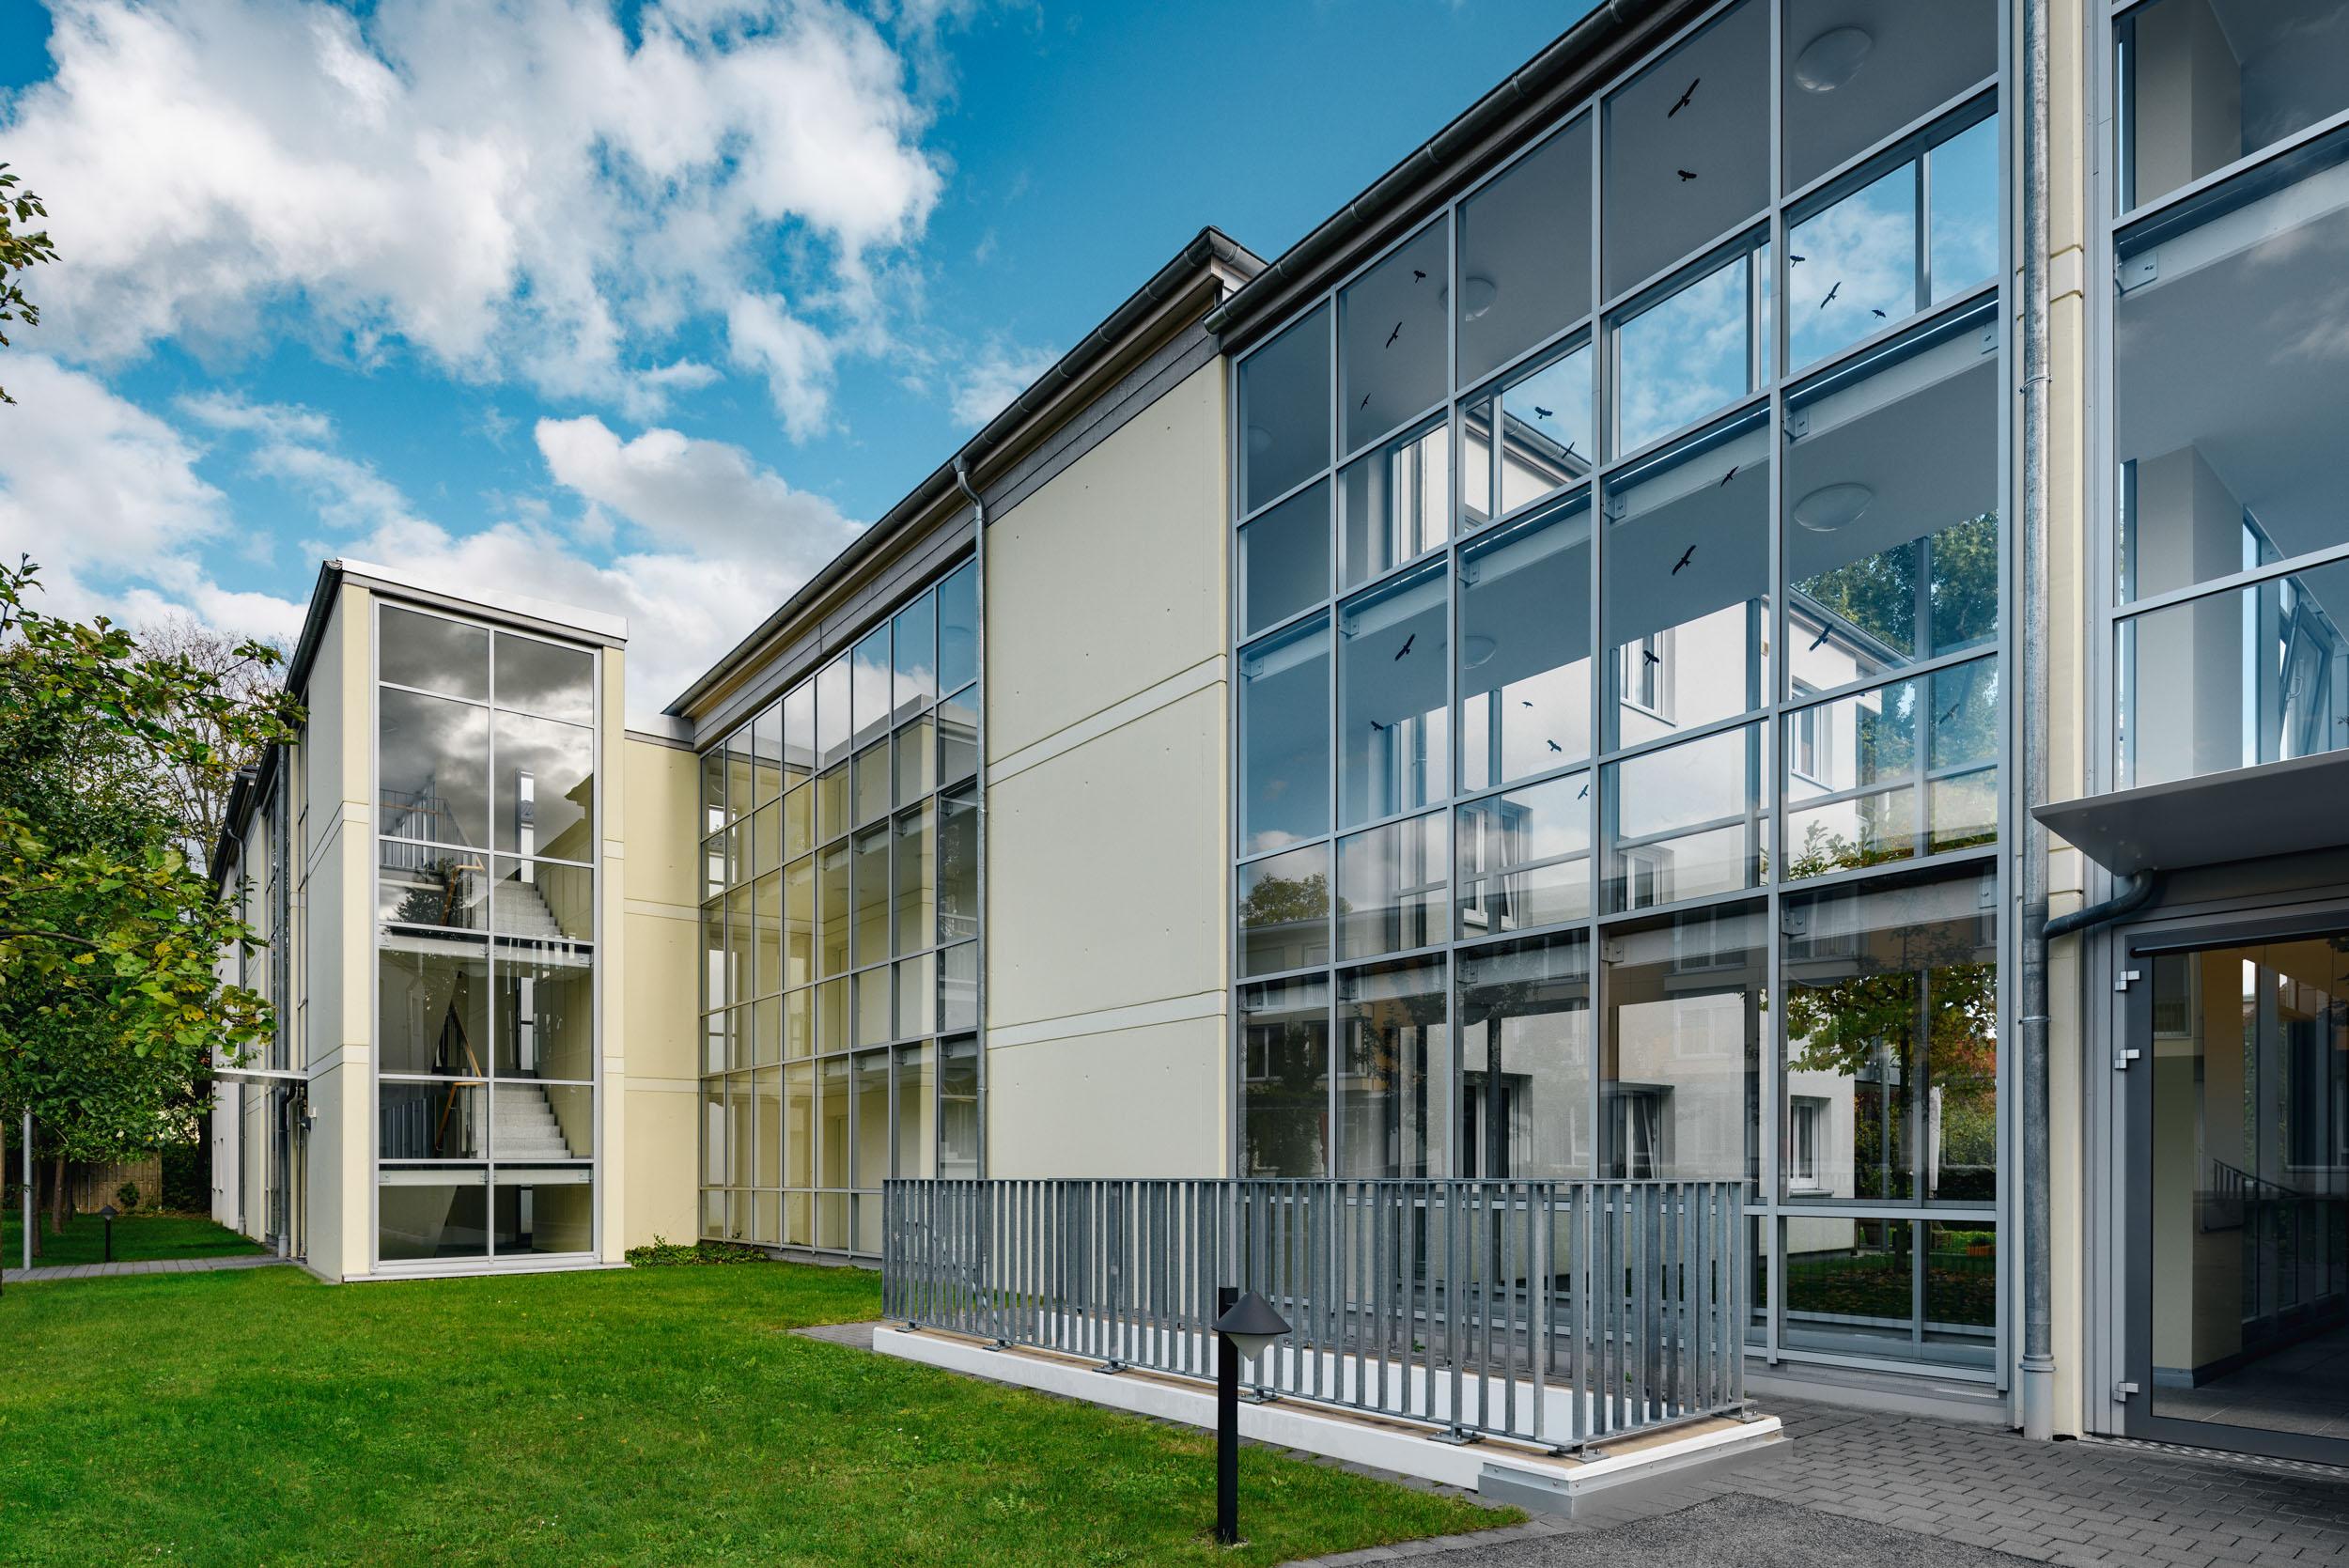 Gustav-Epple-Bauunternehmung-Gesundheit-Pflege-Waldau-StuttgartWaldau_MLX7727#00